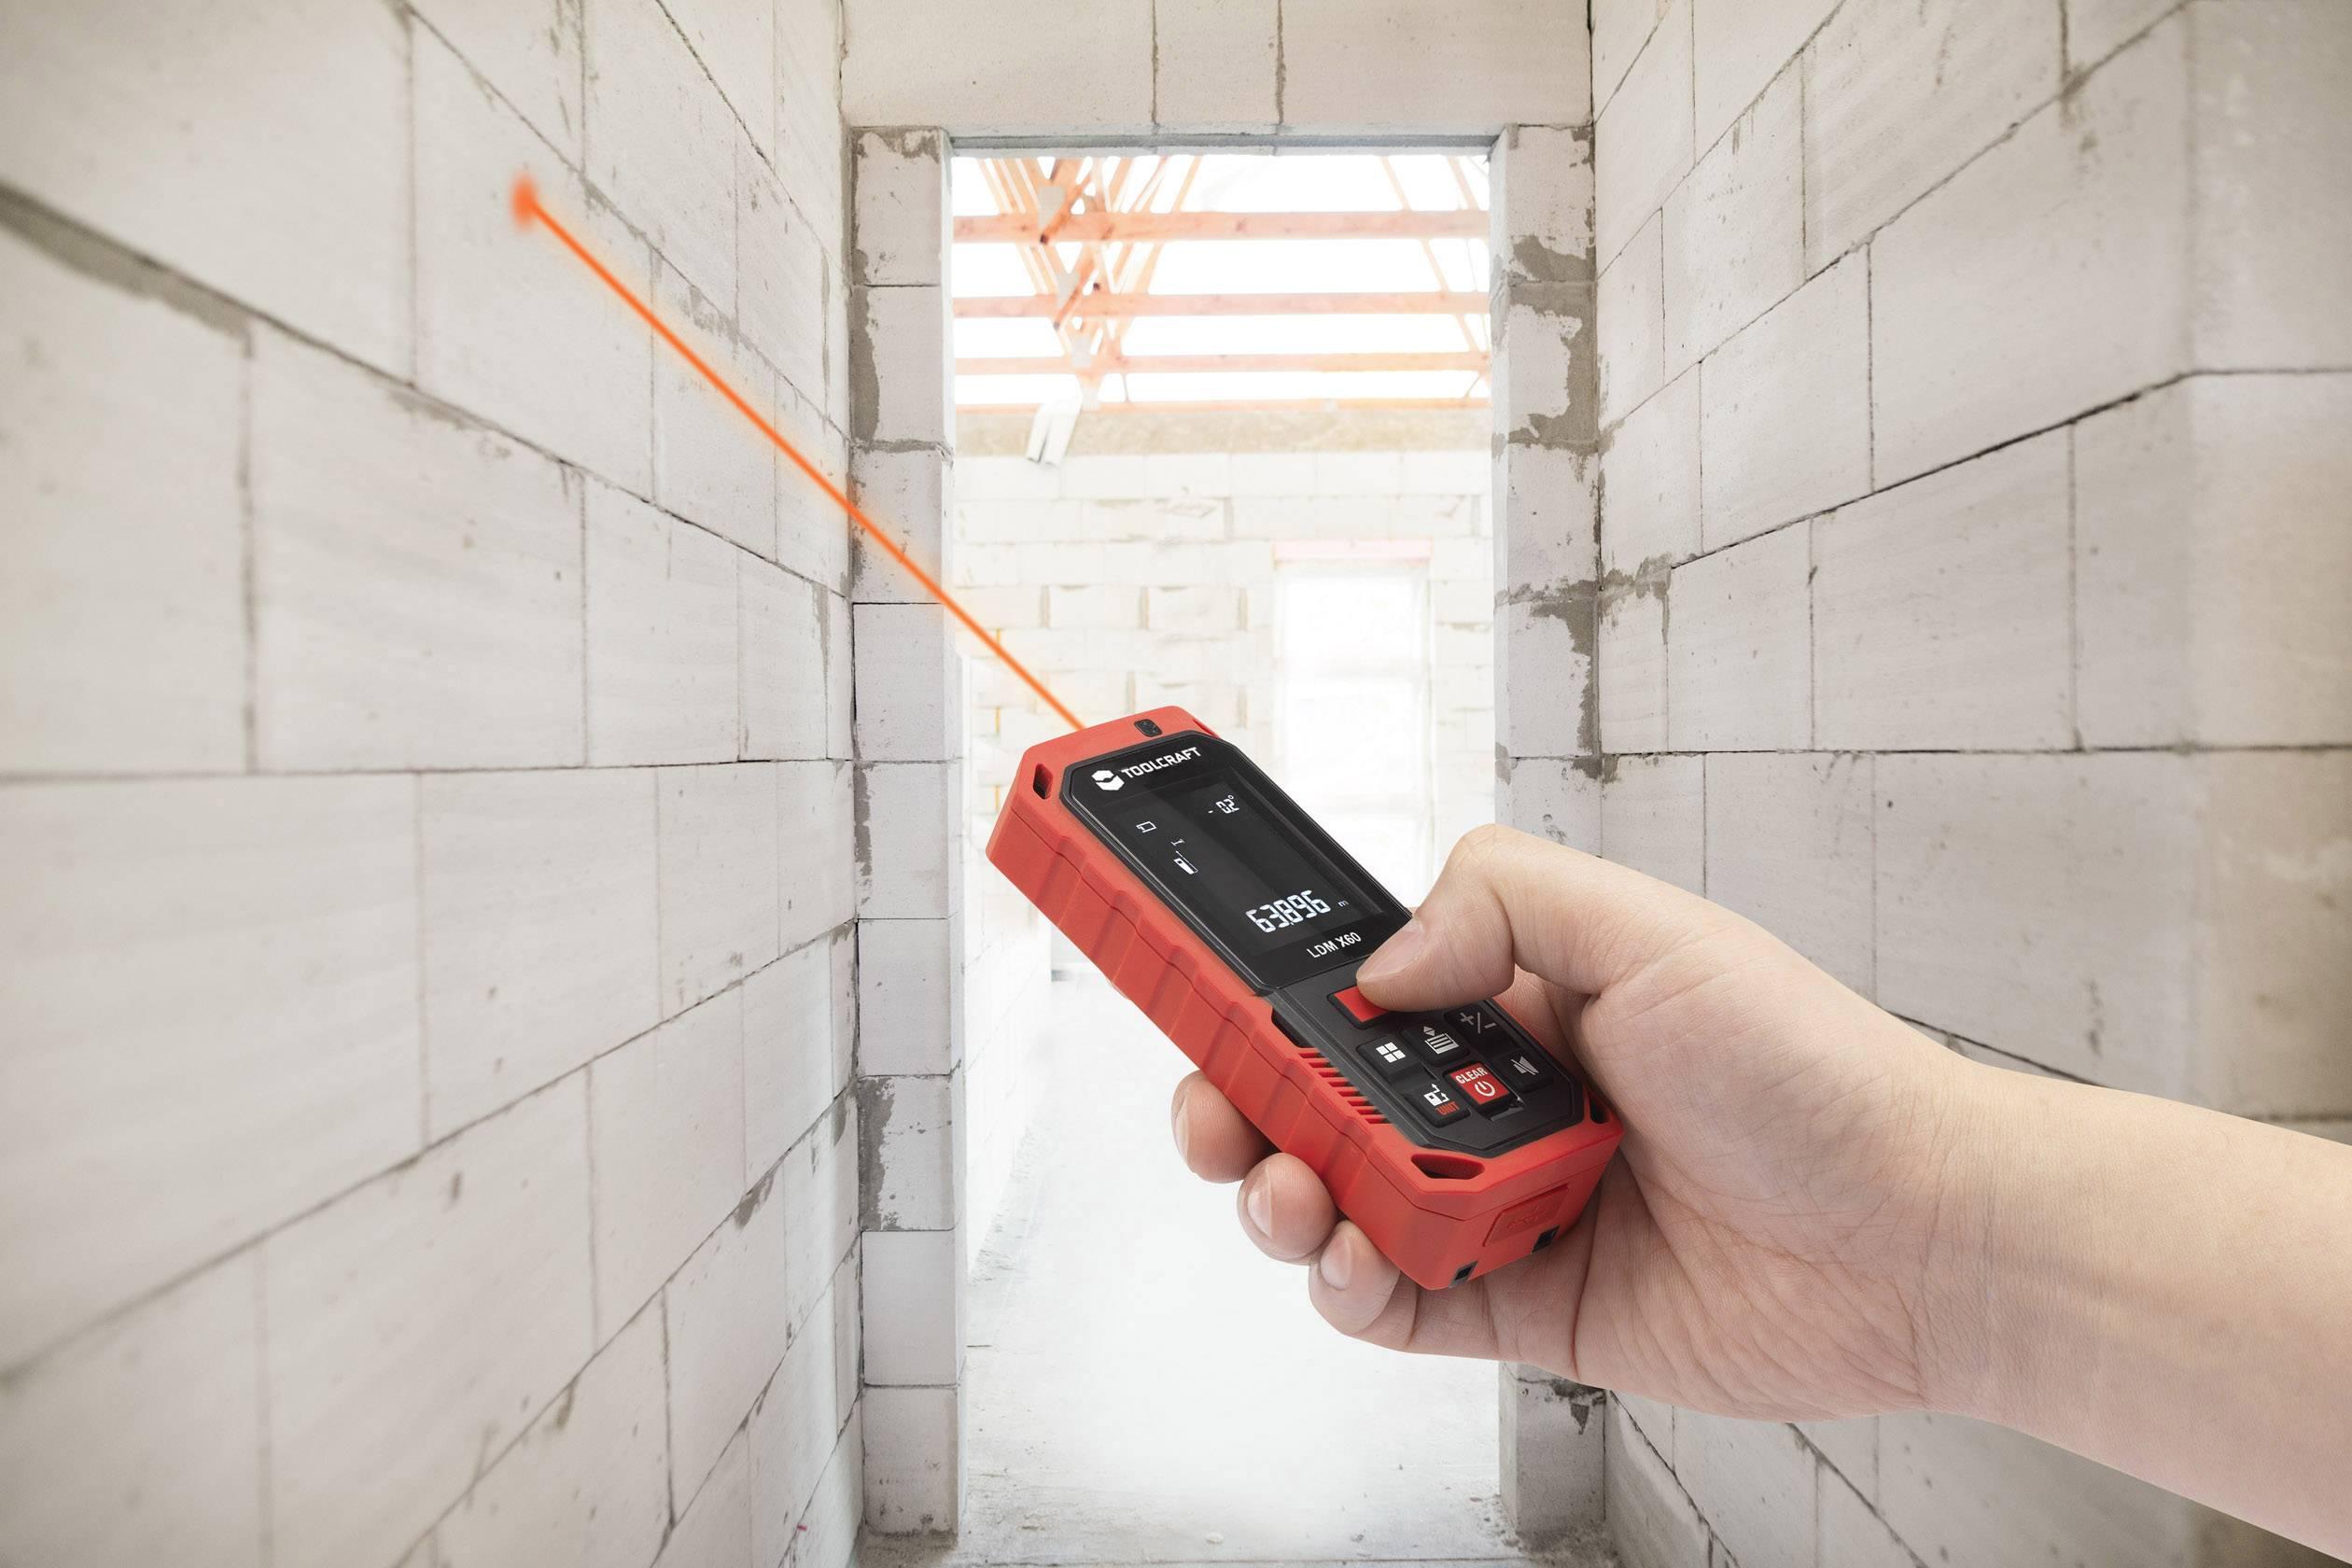 Laser Entfernungsmesser Ex Geschützt : Toolcraft to lmd laser entfernungsmesser messbereich max